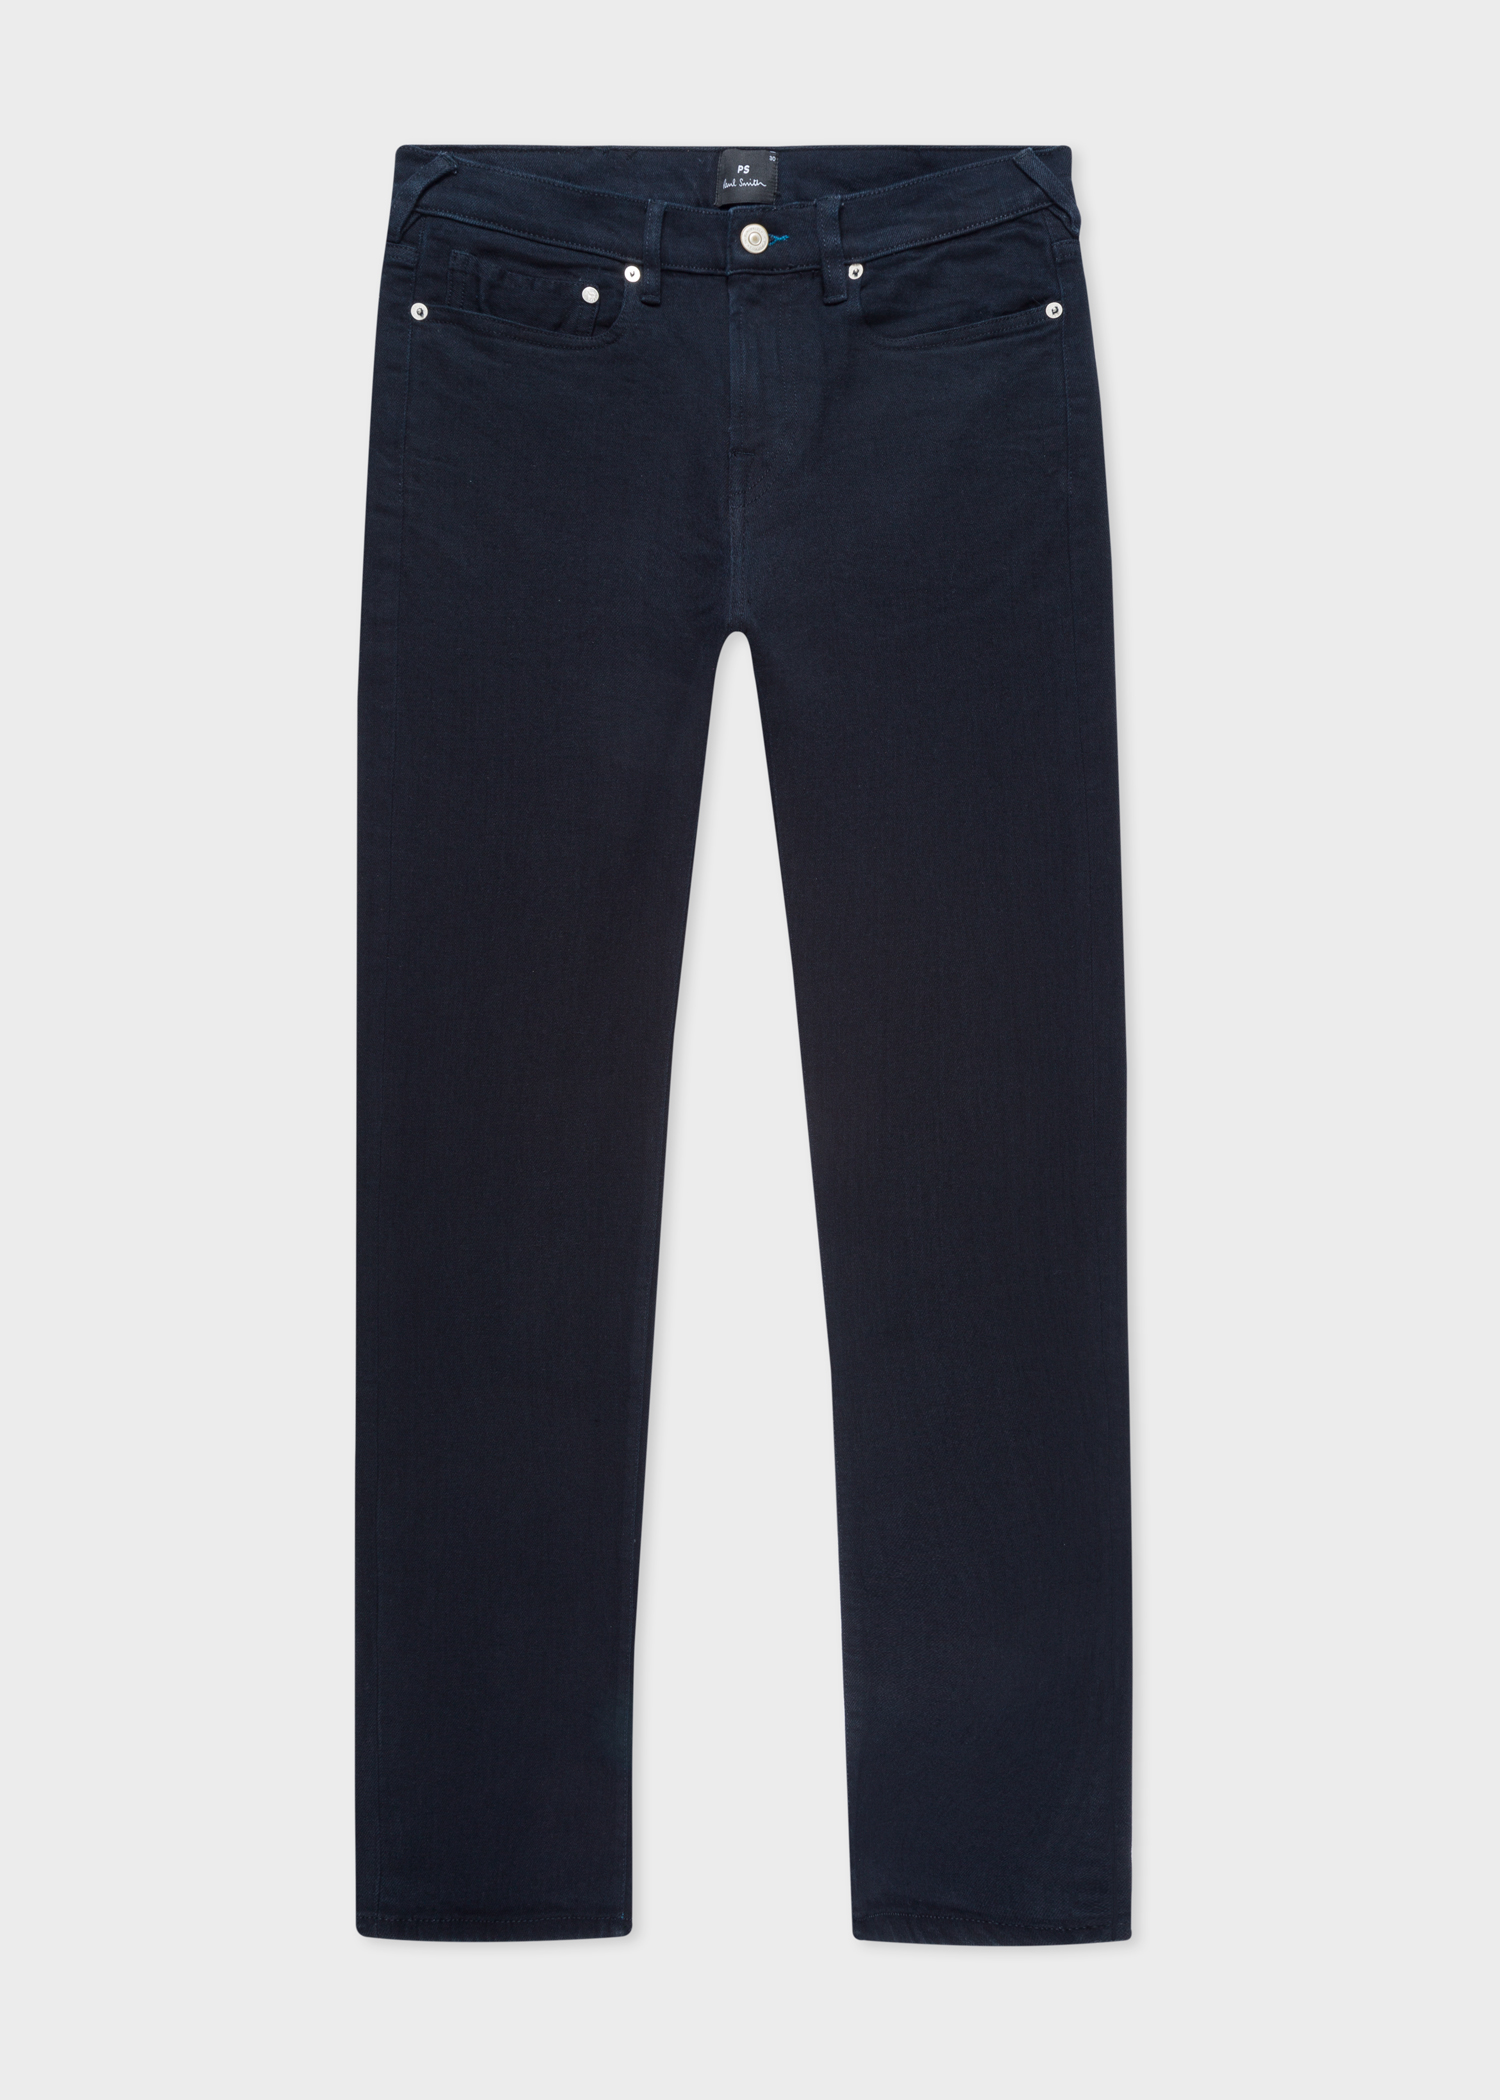 969715ac72a7 Men's Dark Navy Skinny-Fit 'Blue/Black Reflex' Jeans - Paul Smith Asia